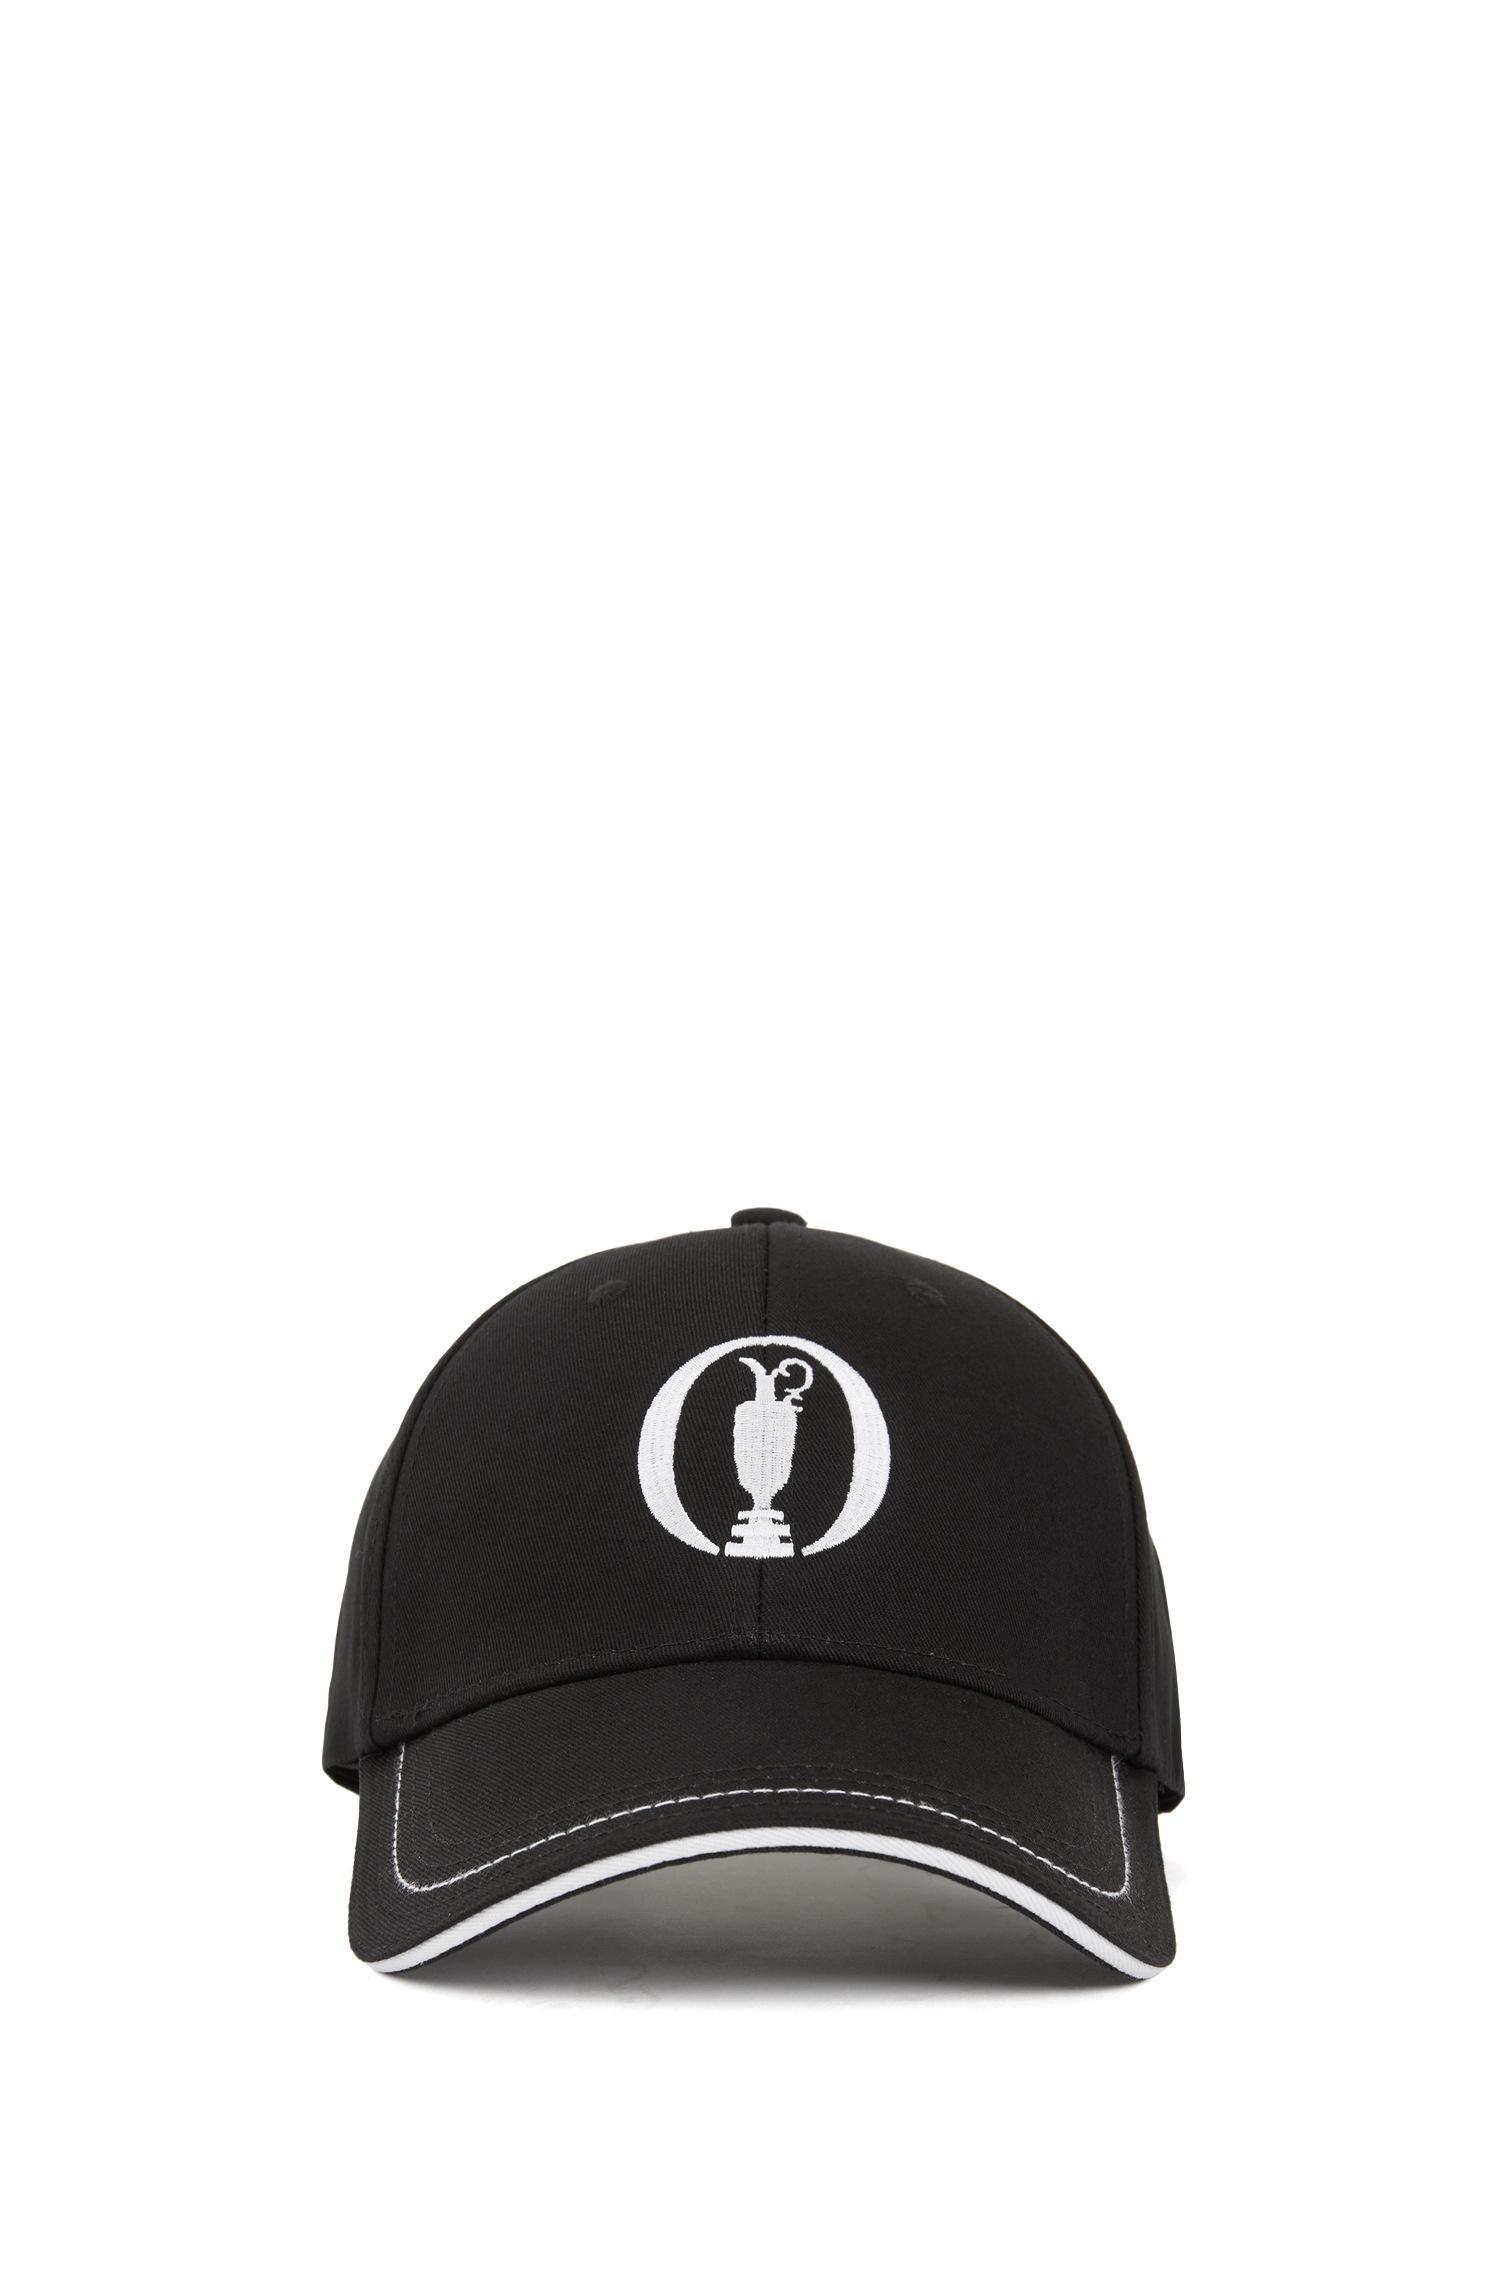 5694e530eb8 BOSS - Black The Open Exclusive Cap In Cotton Twill for Men - Lyst. View  fullscreen